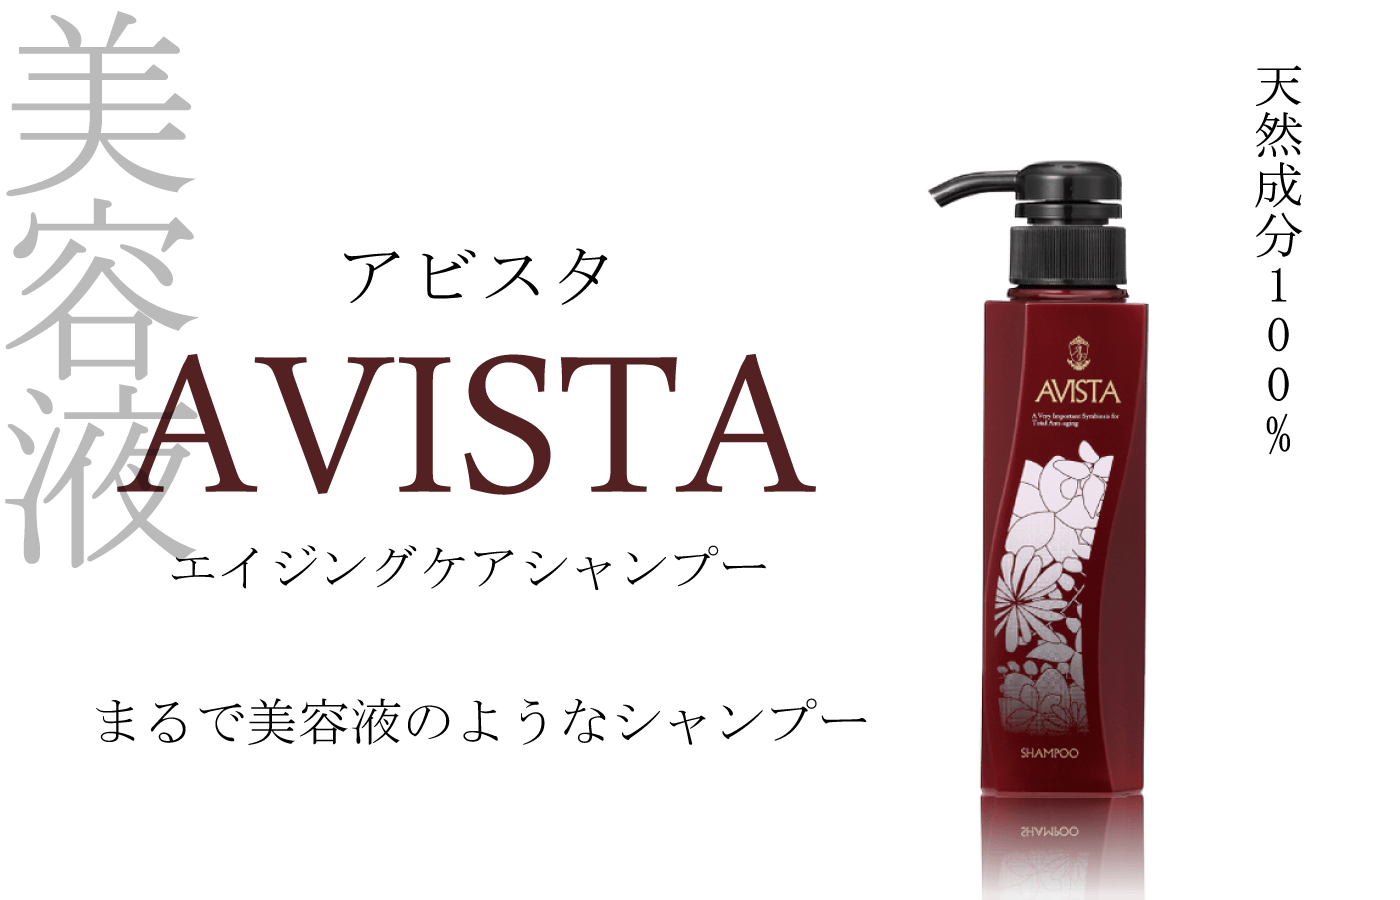 AVISTA アビスタ エイジングケアシャンプーの成分解析